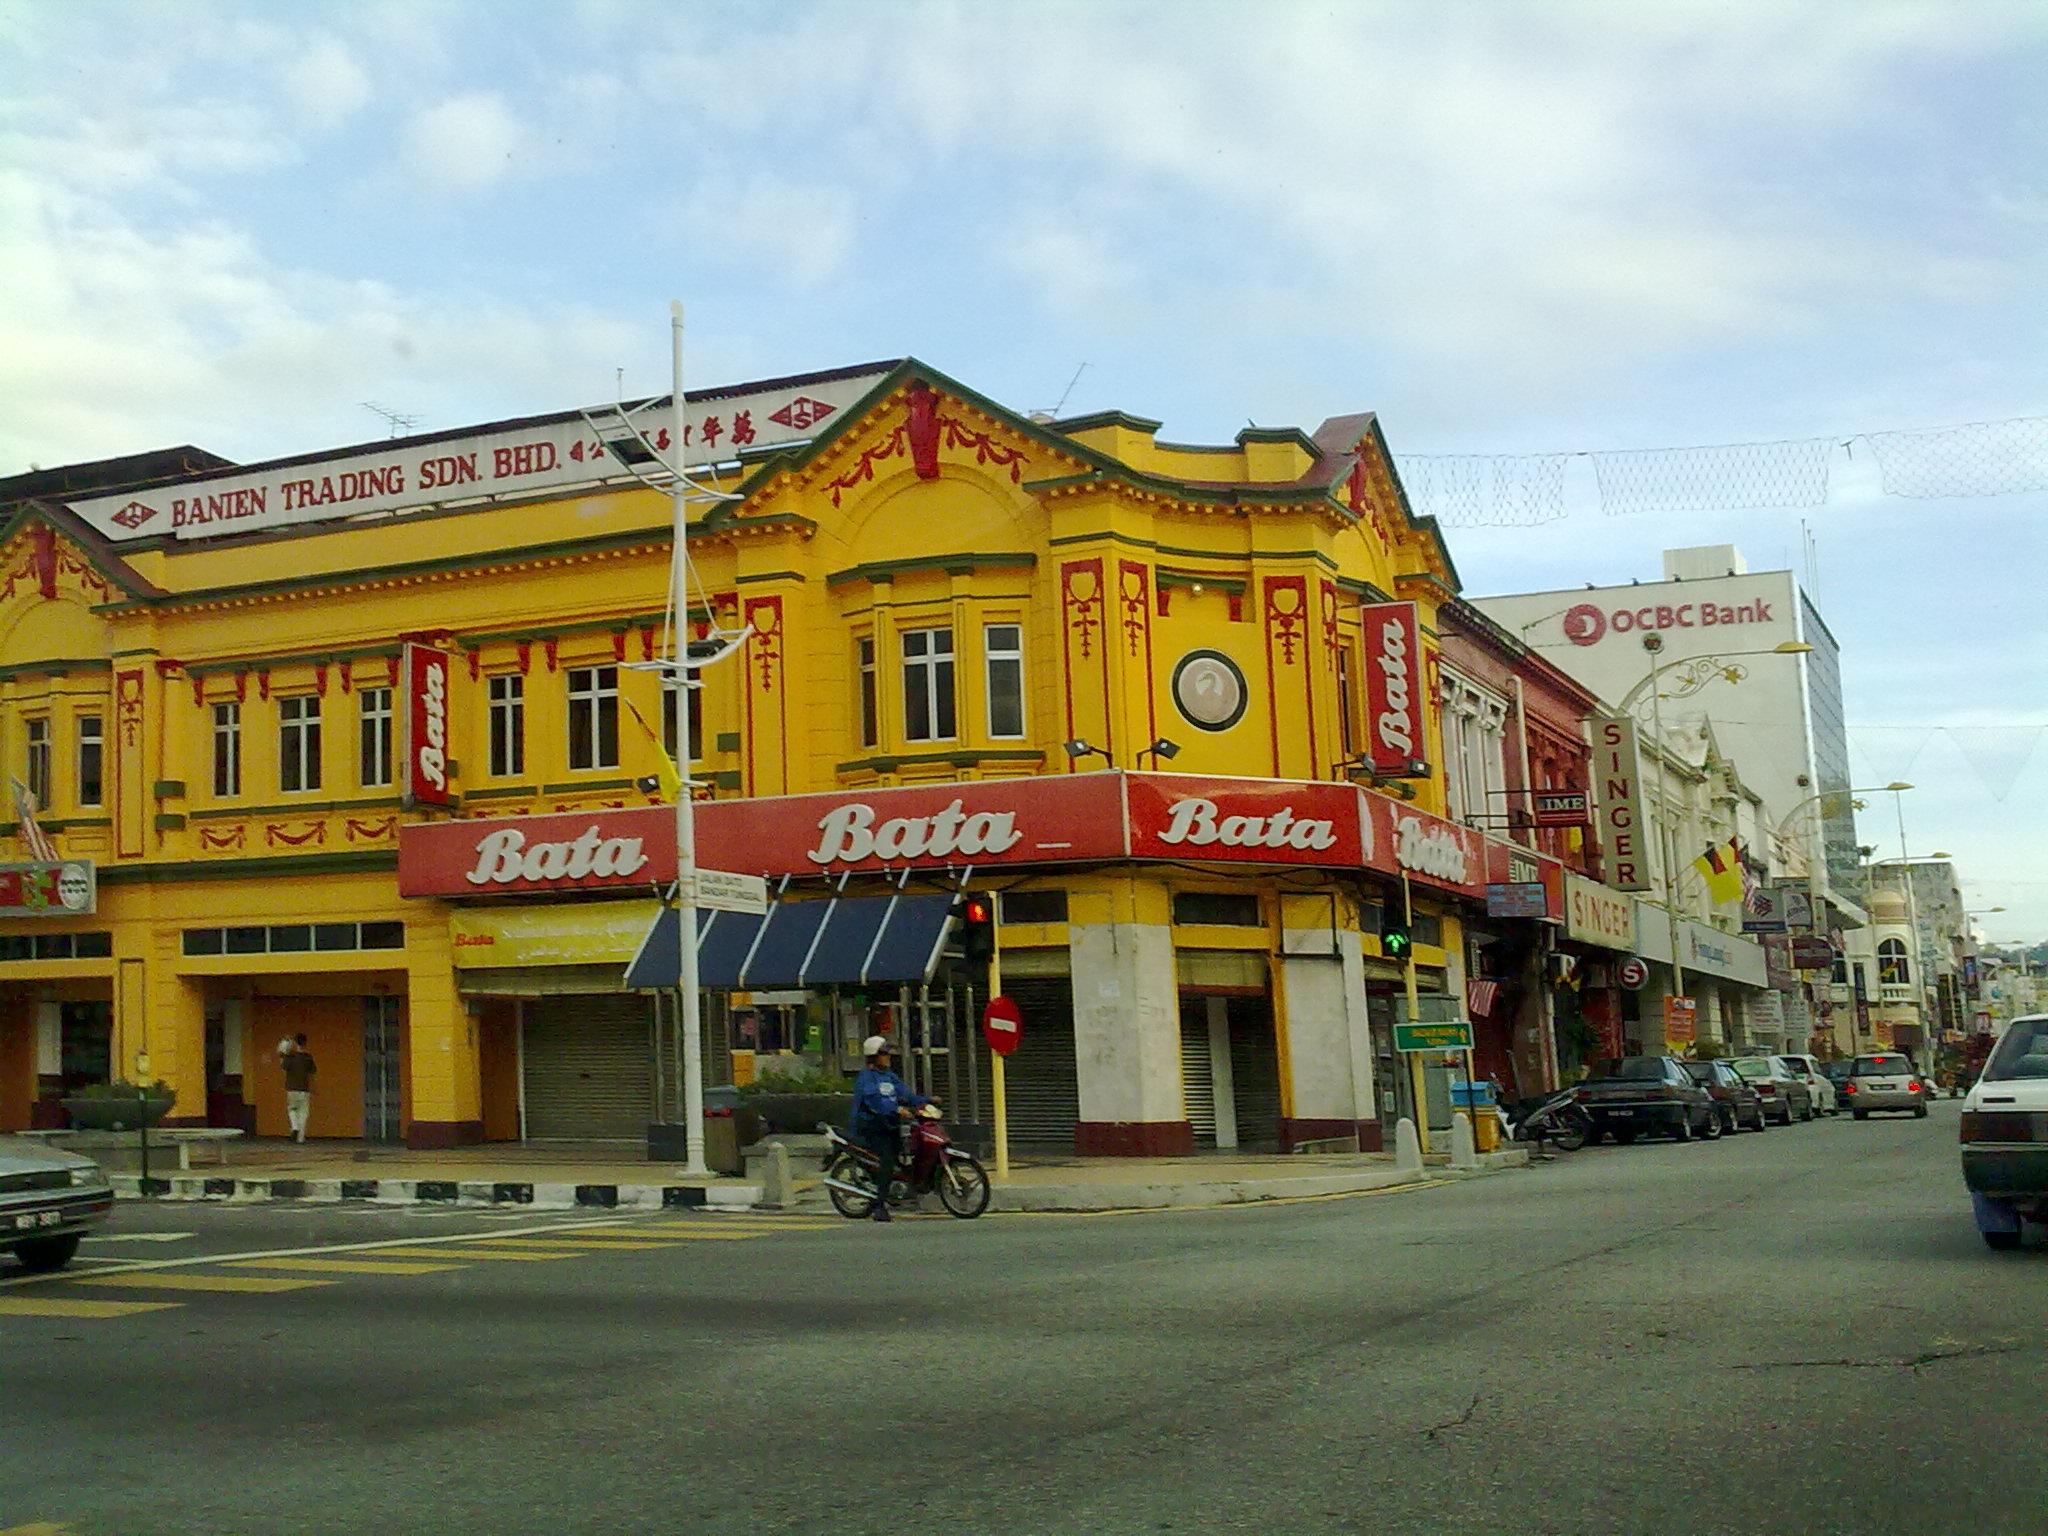 View of Seremban. Photo taken on August 29, 2009.